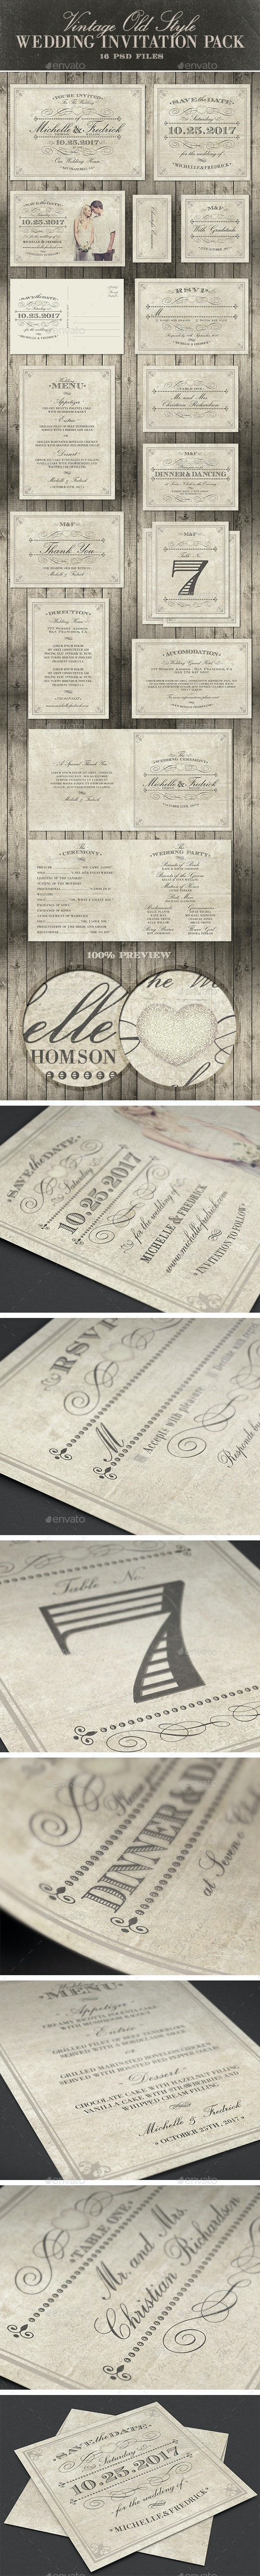 Wedding Invitation Package - Vintage Old Style - Weddings Cards & Invites